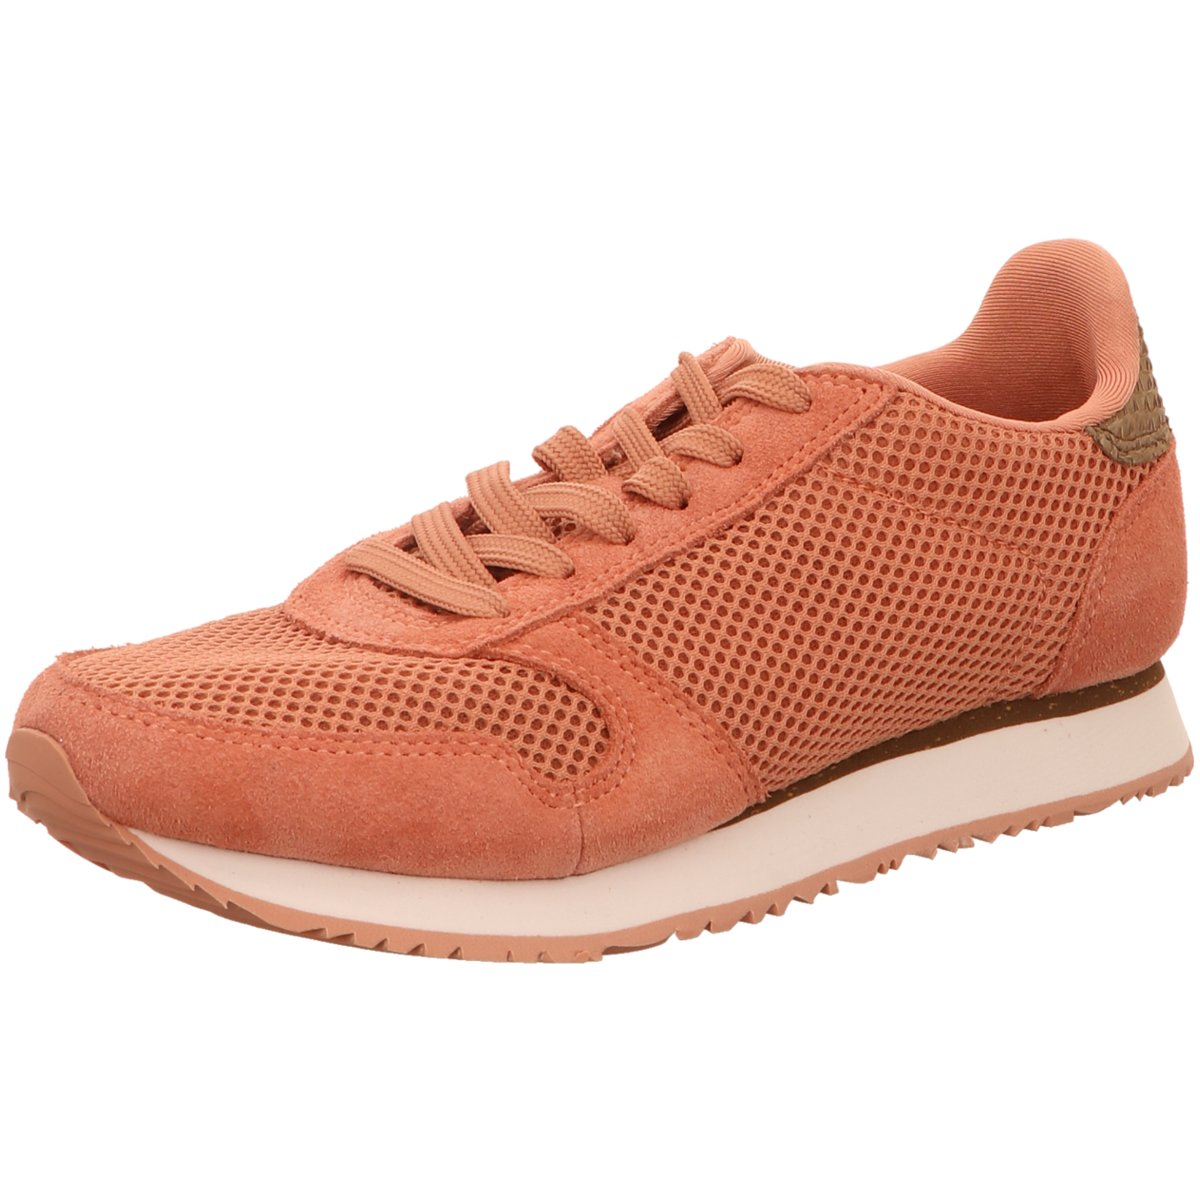 NEU Woden Damen Sneaker WL029 500 beige 445954